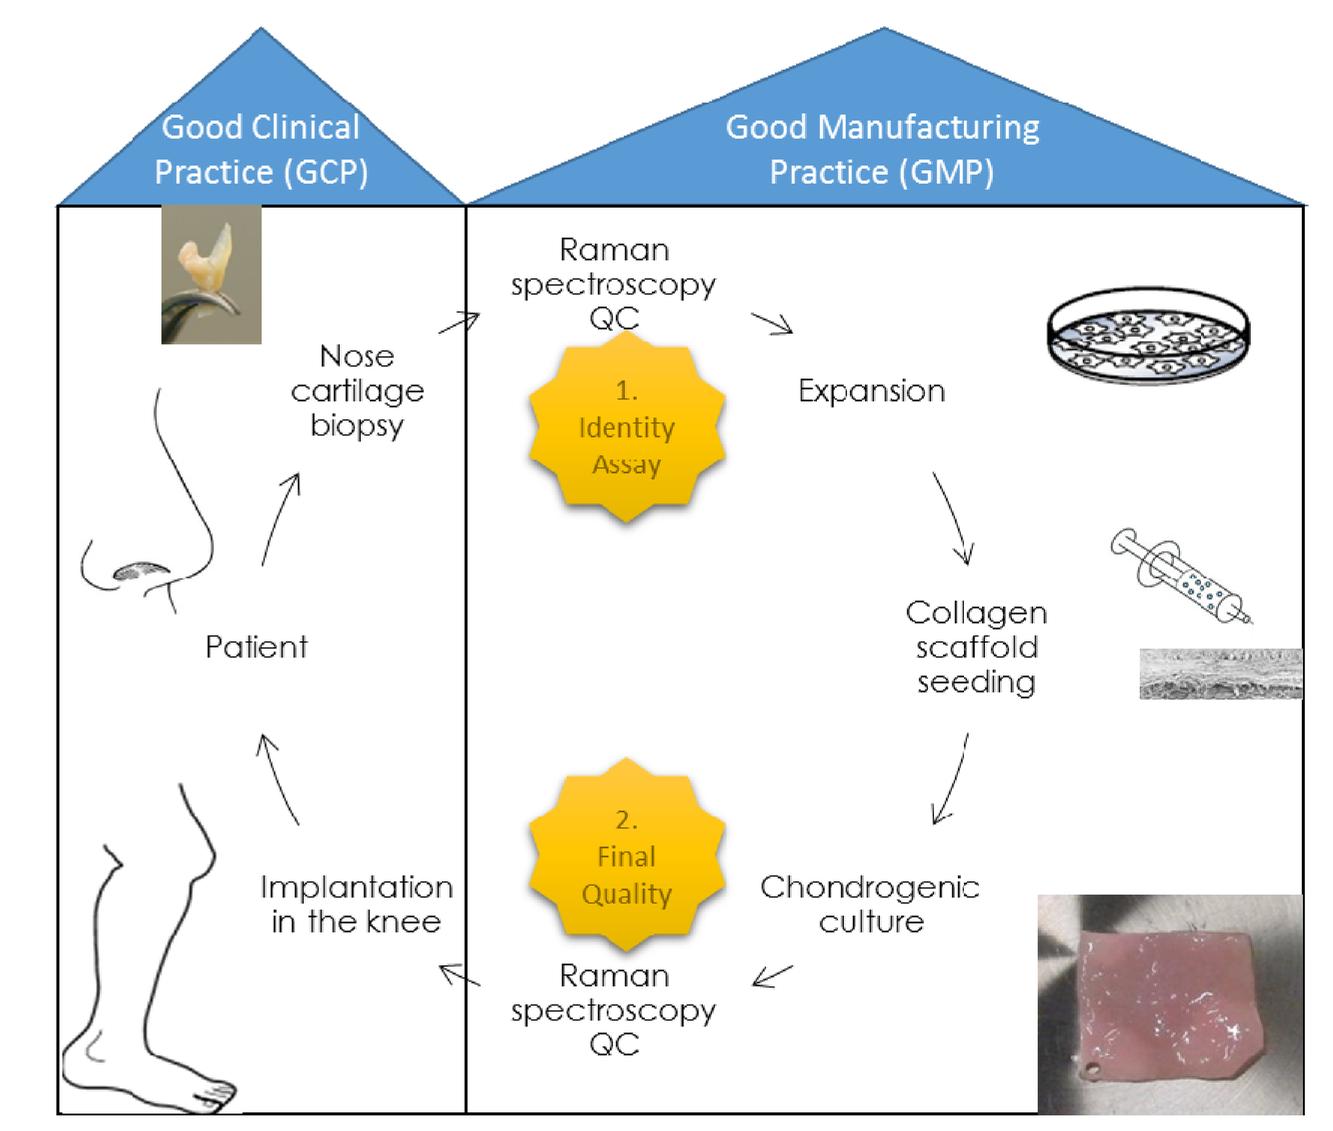 Raman spectroscopy quality controls for GMP compliant